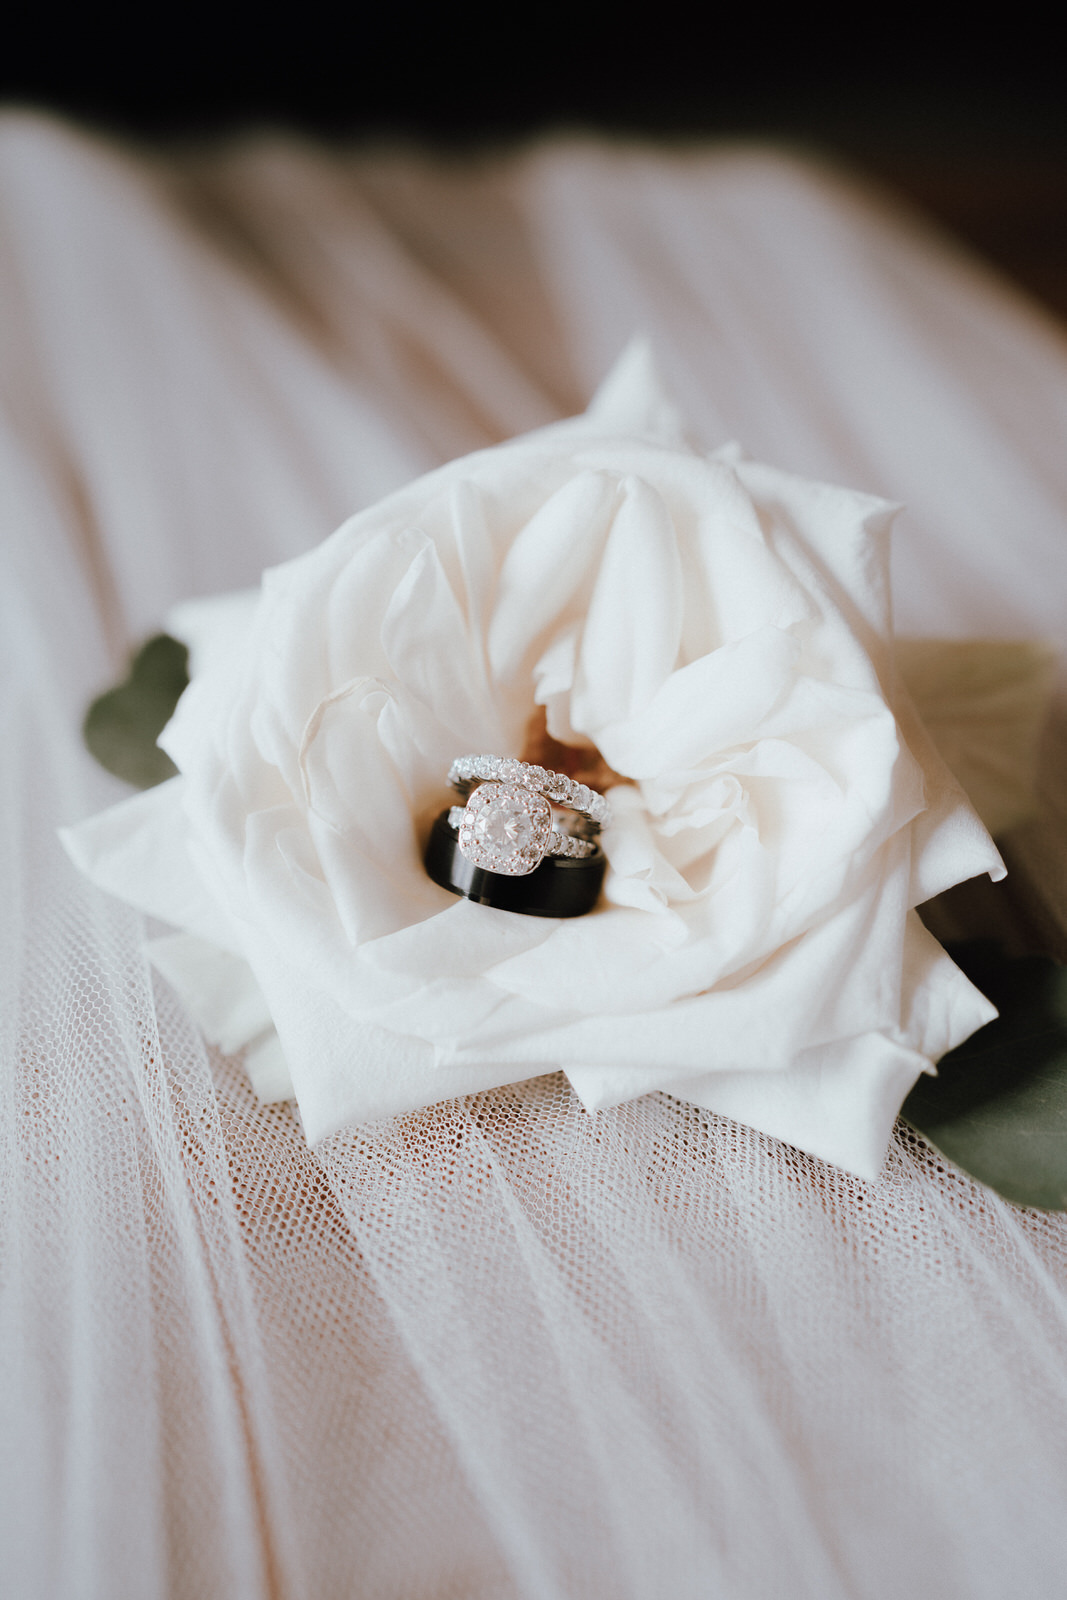 Club at the Strand Wedding- Naples Florida Wedding Photographer- Michelle Gonzalez Photography- Desiree and Bryan-21.JPG